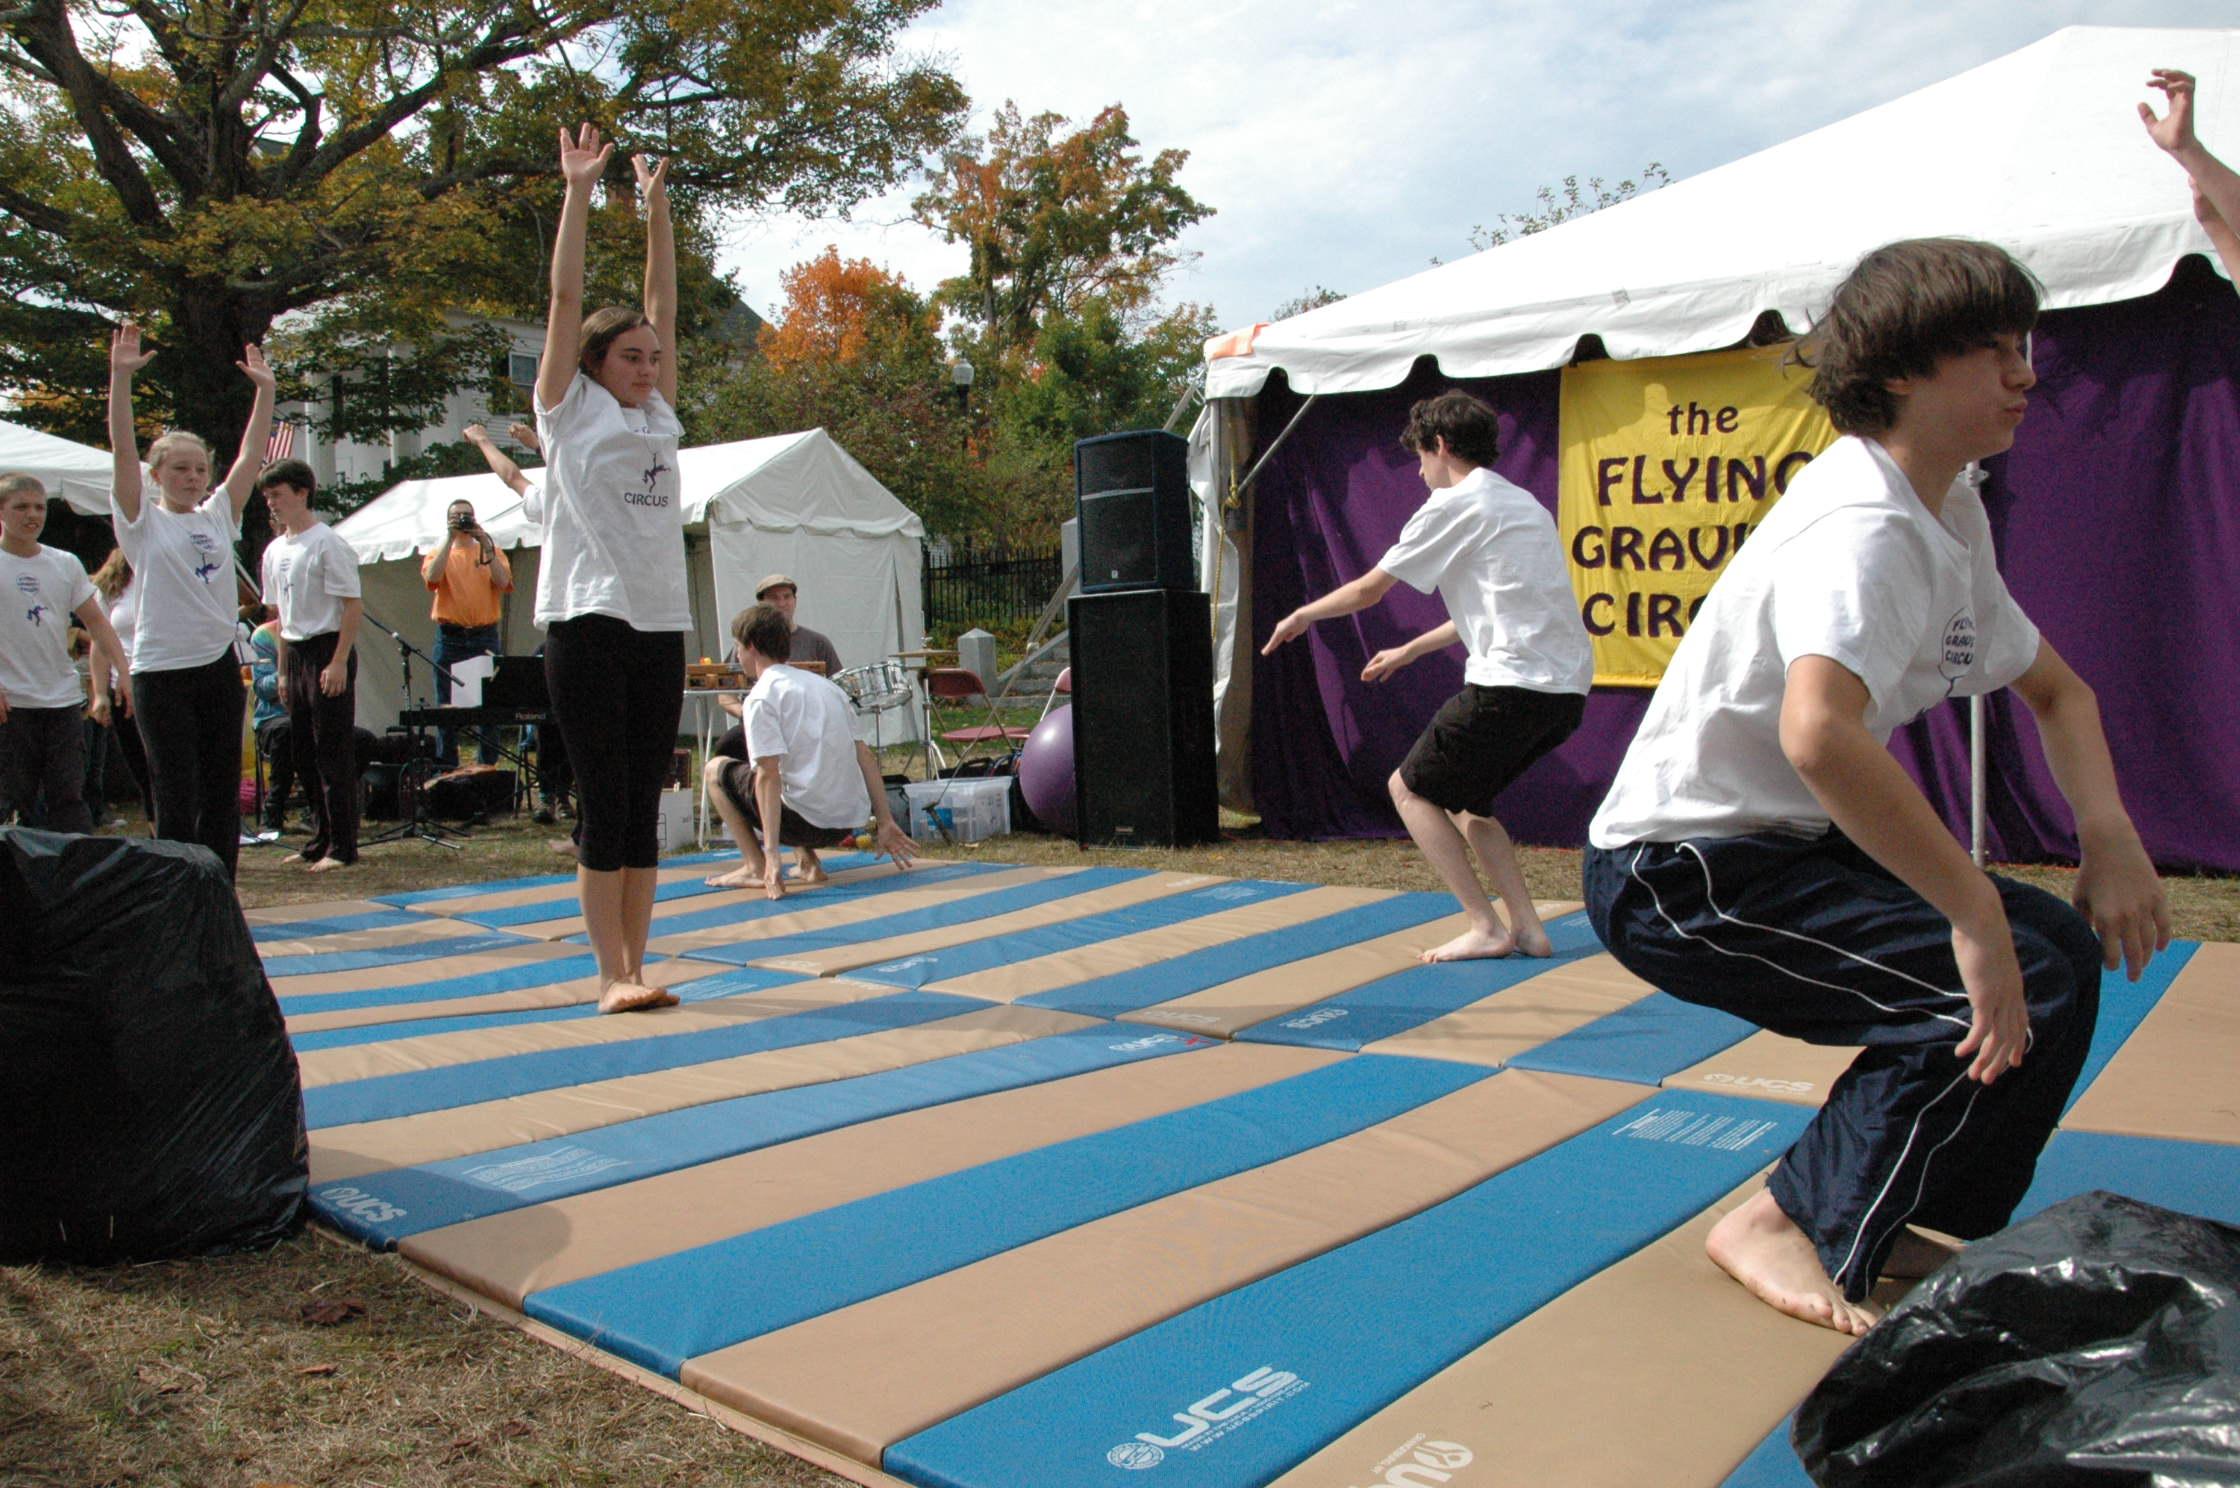 2012-10-06 Flyin Gravity Circus - Pumpkin 037.JPG